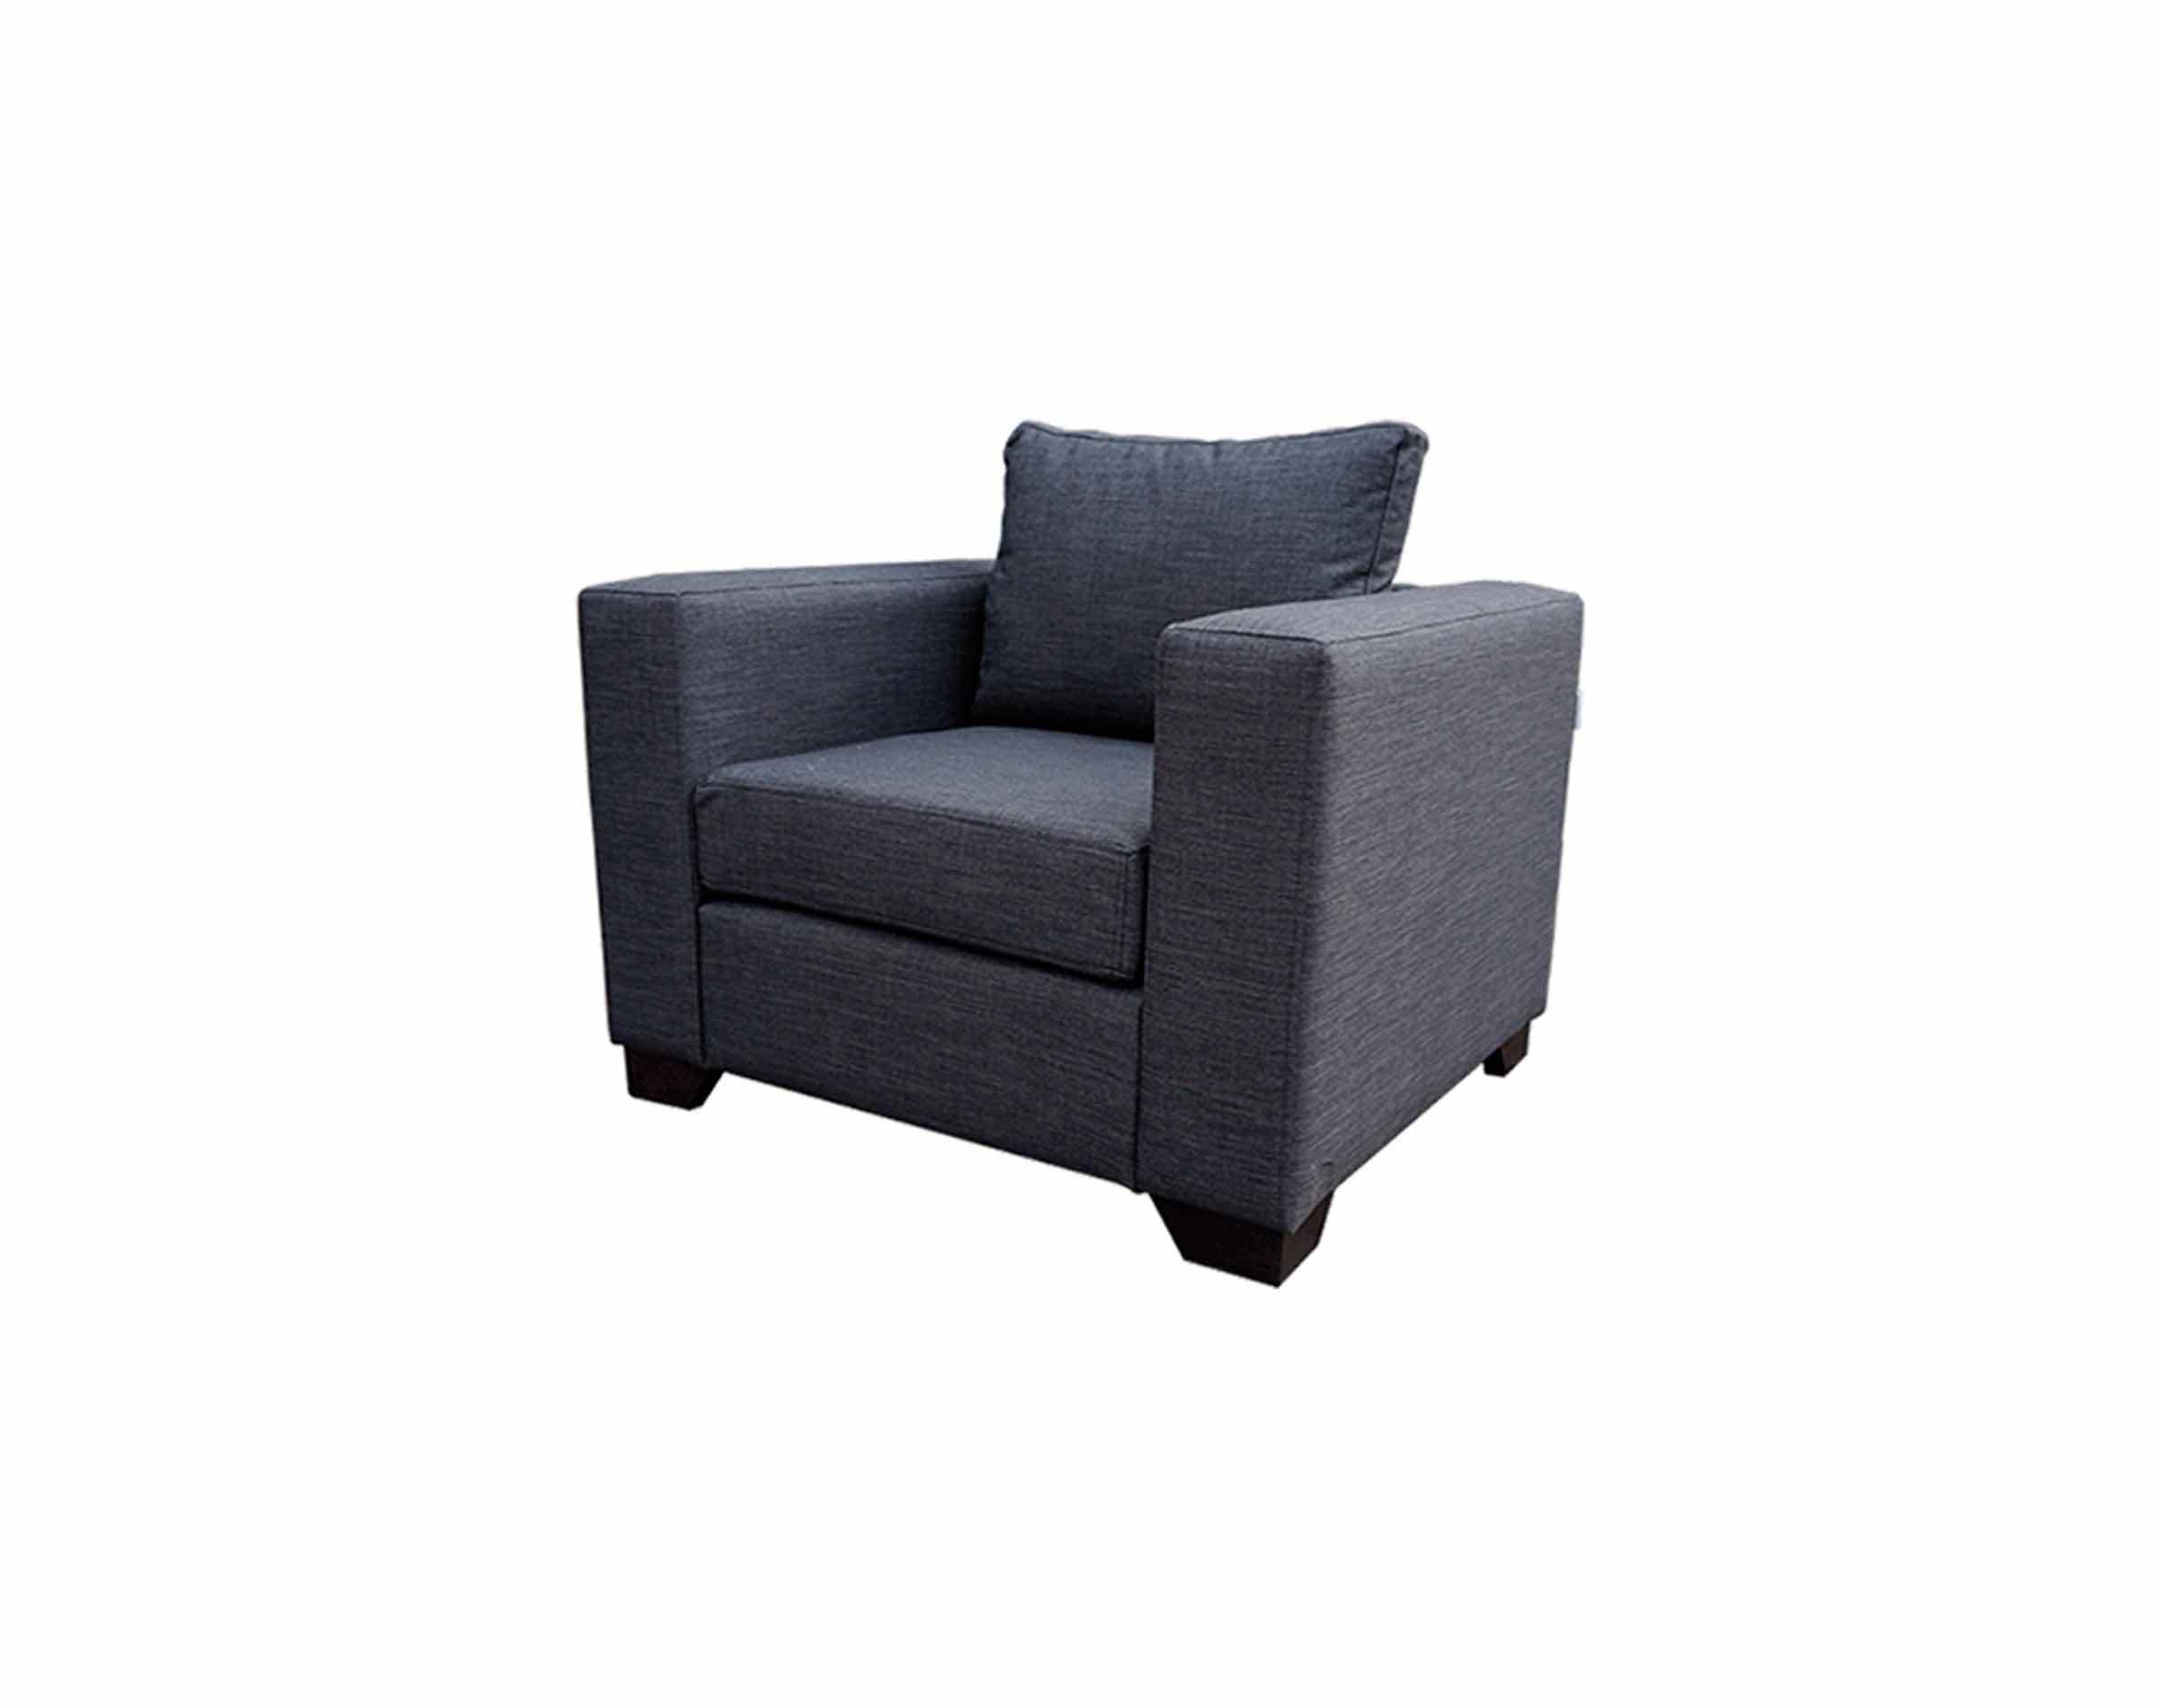 sofa-1c-monaco-bariloche-marengo-2